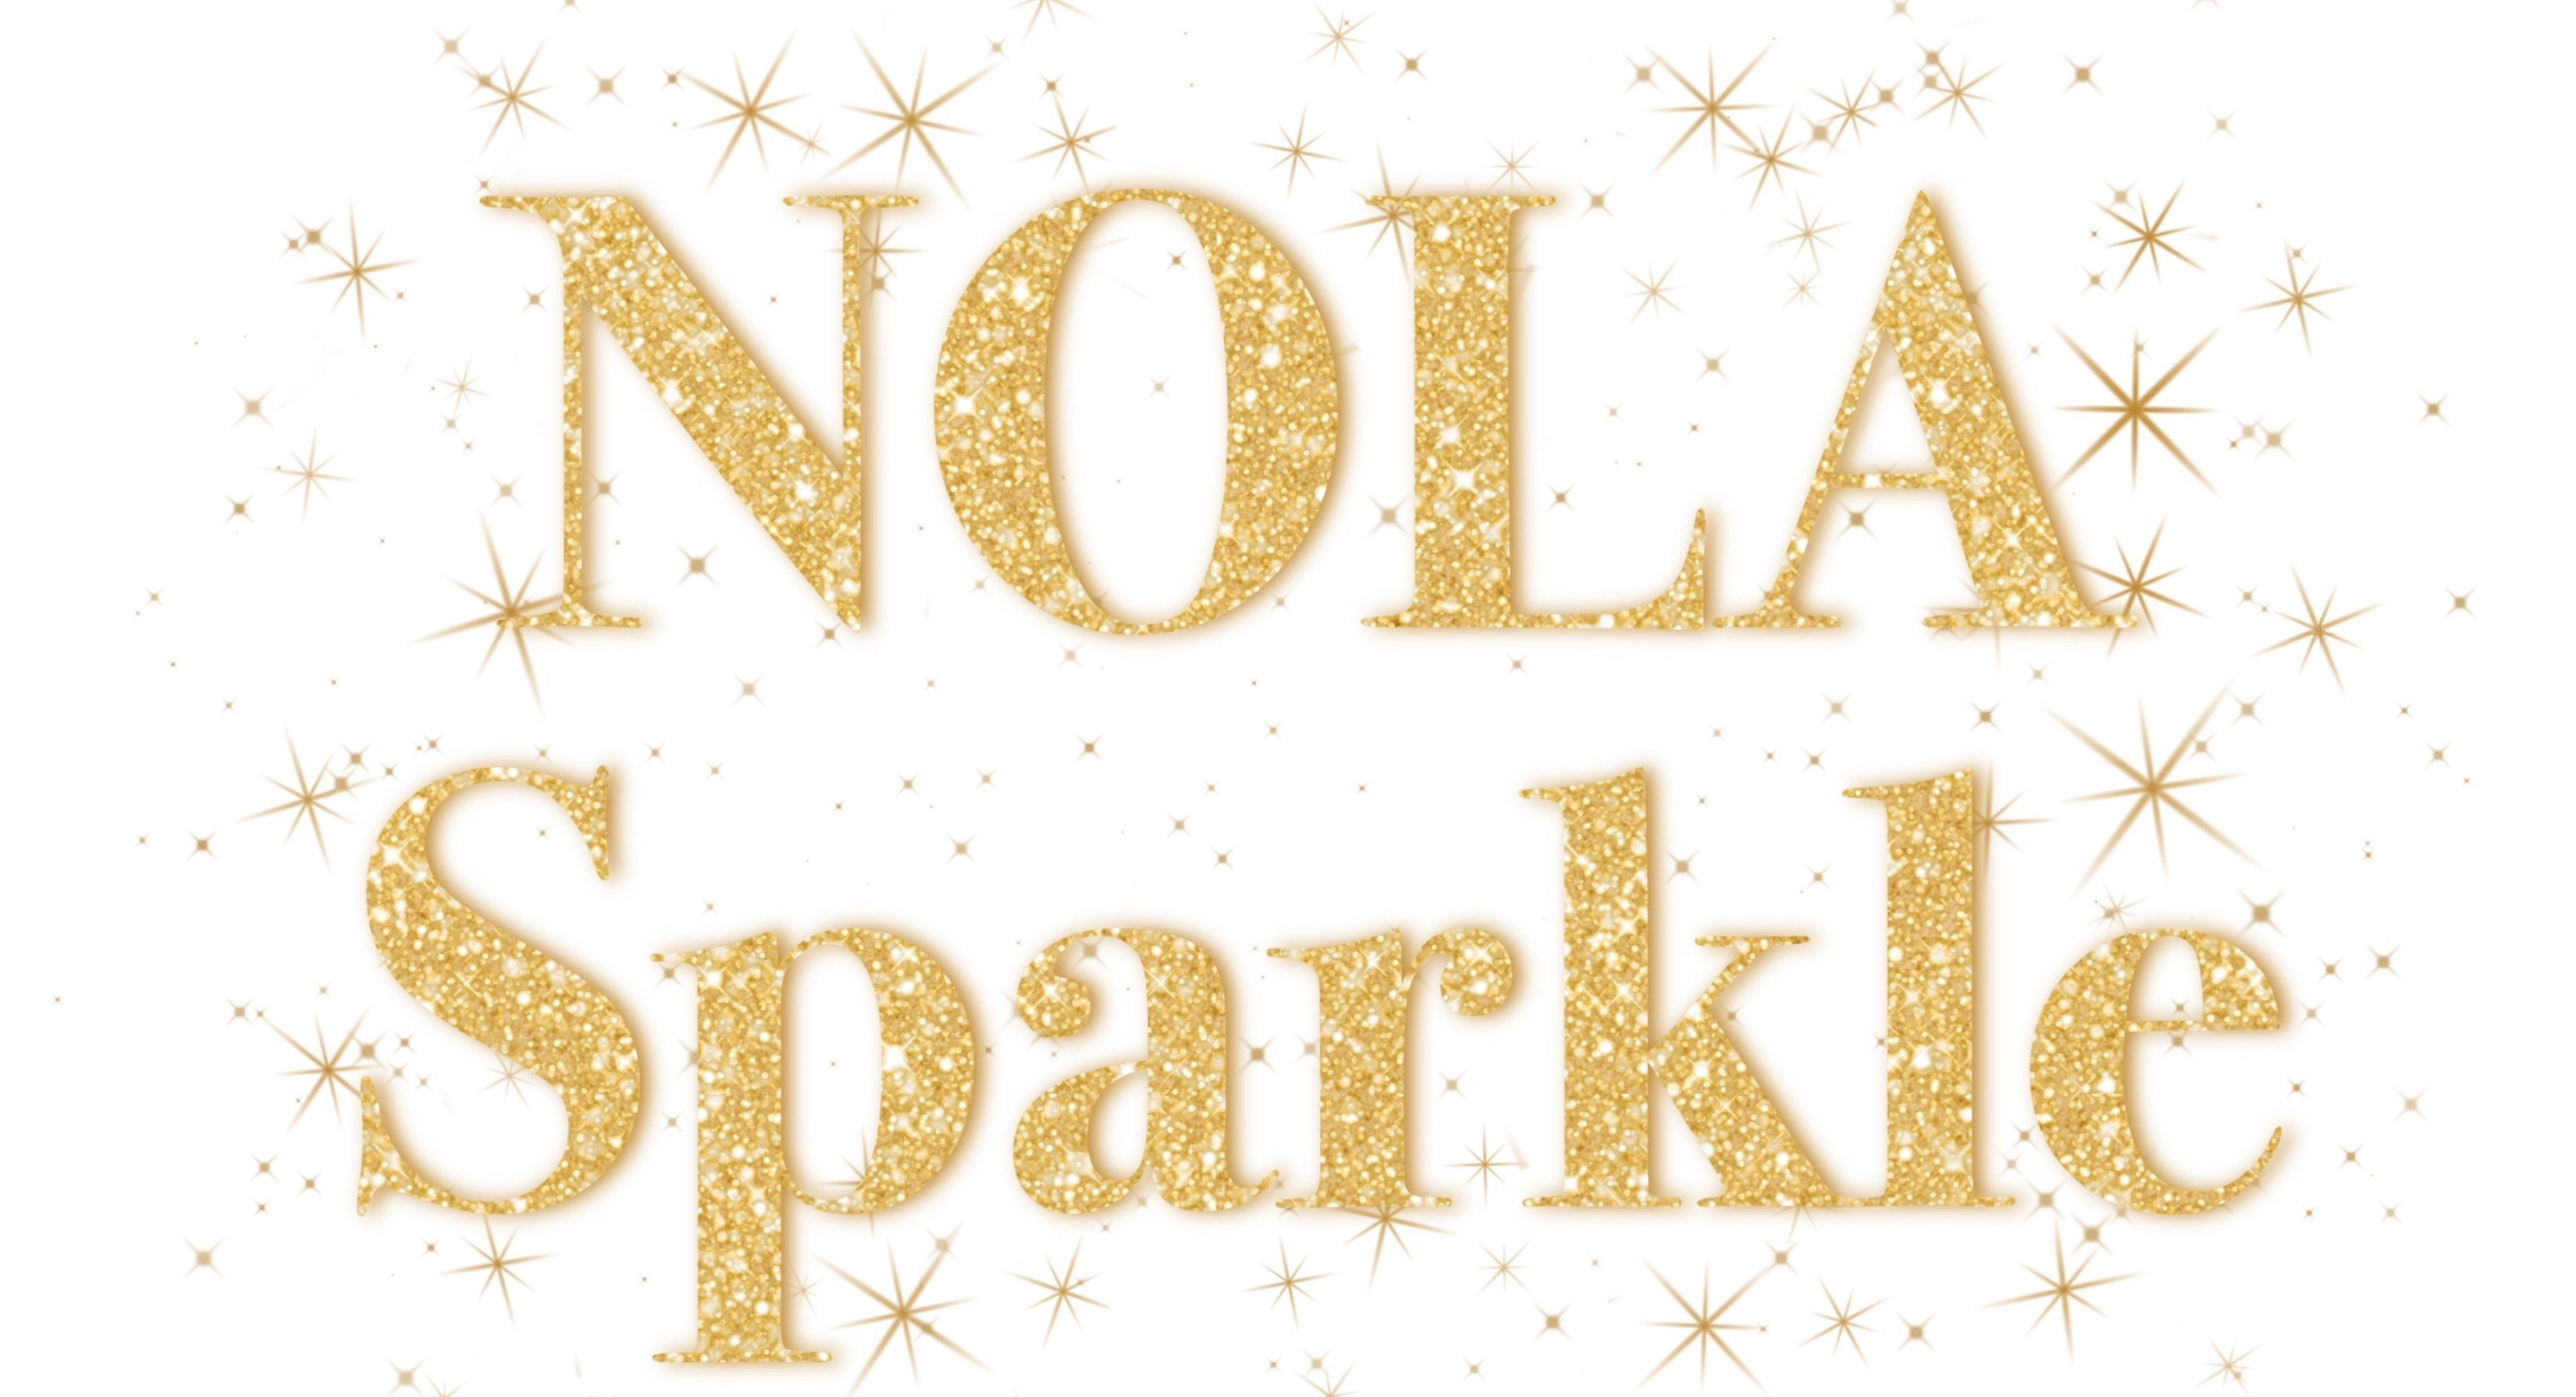 NOLA SPARKLE